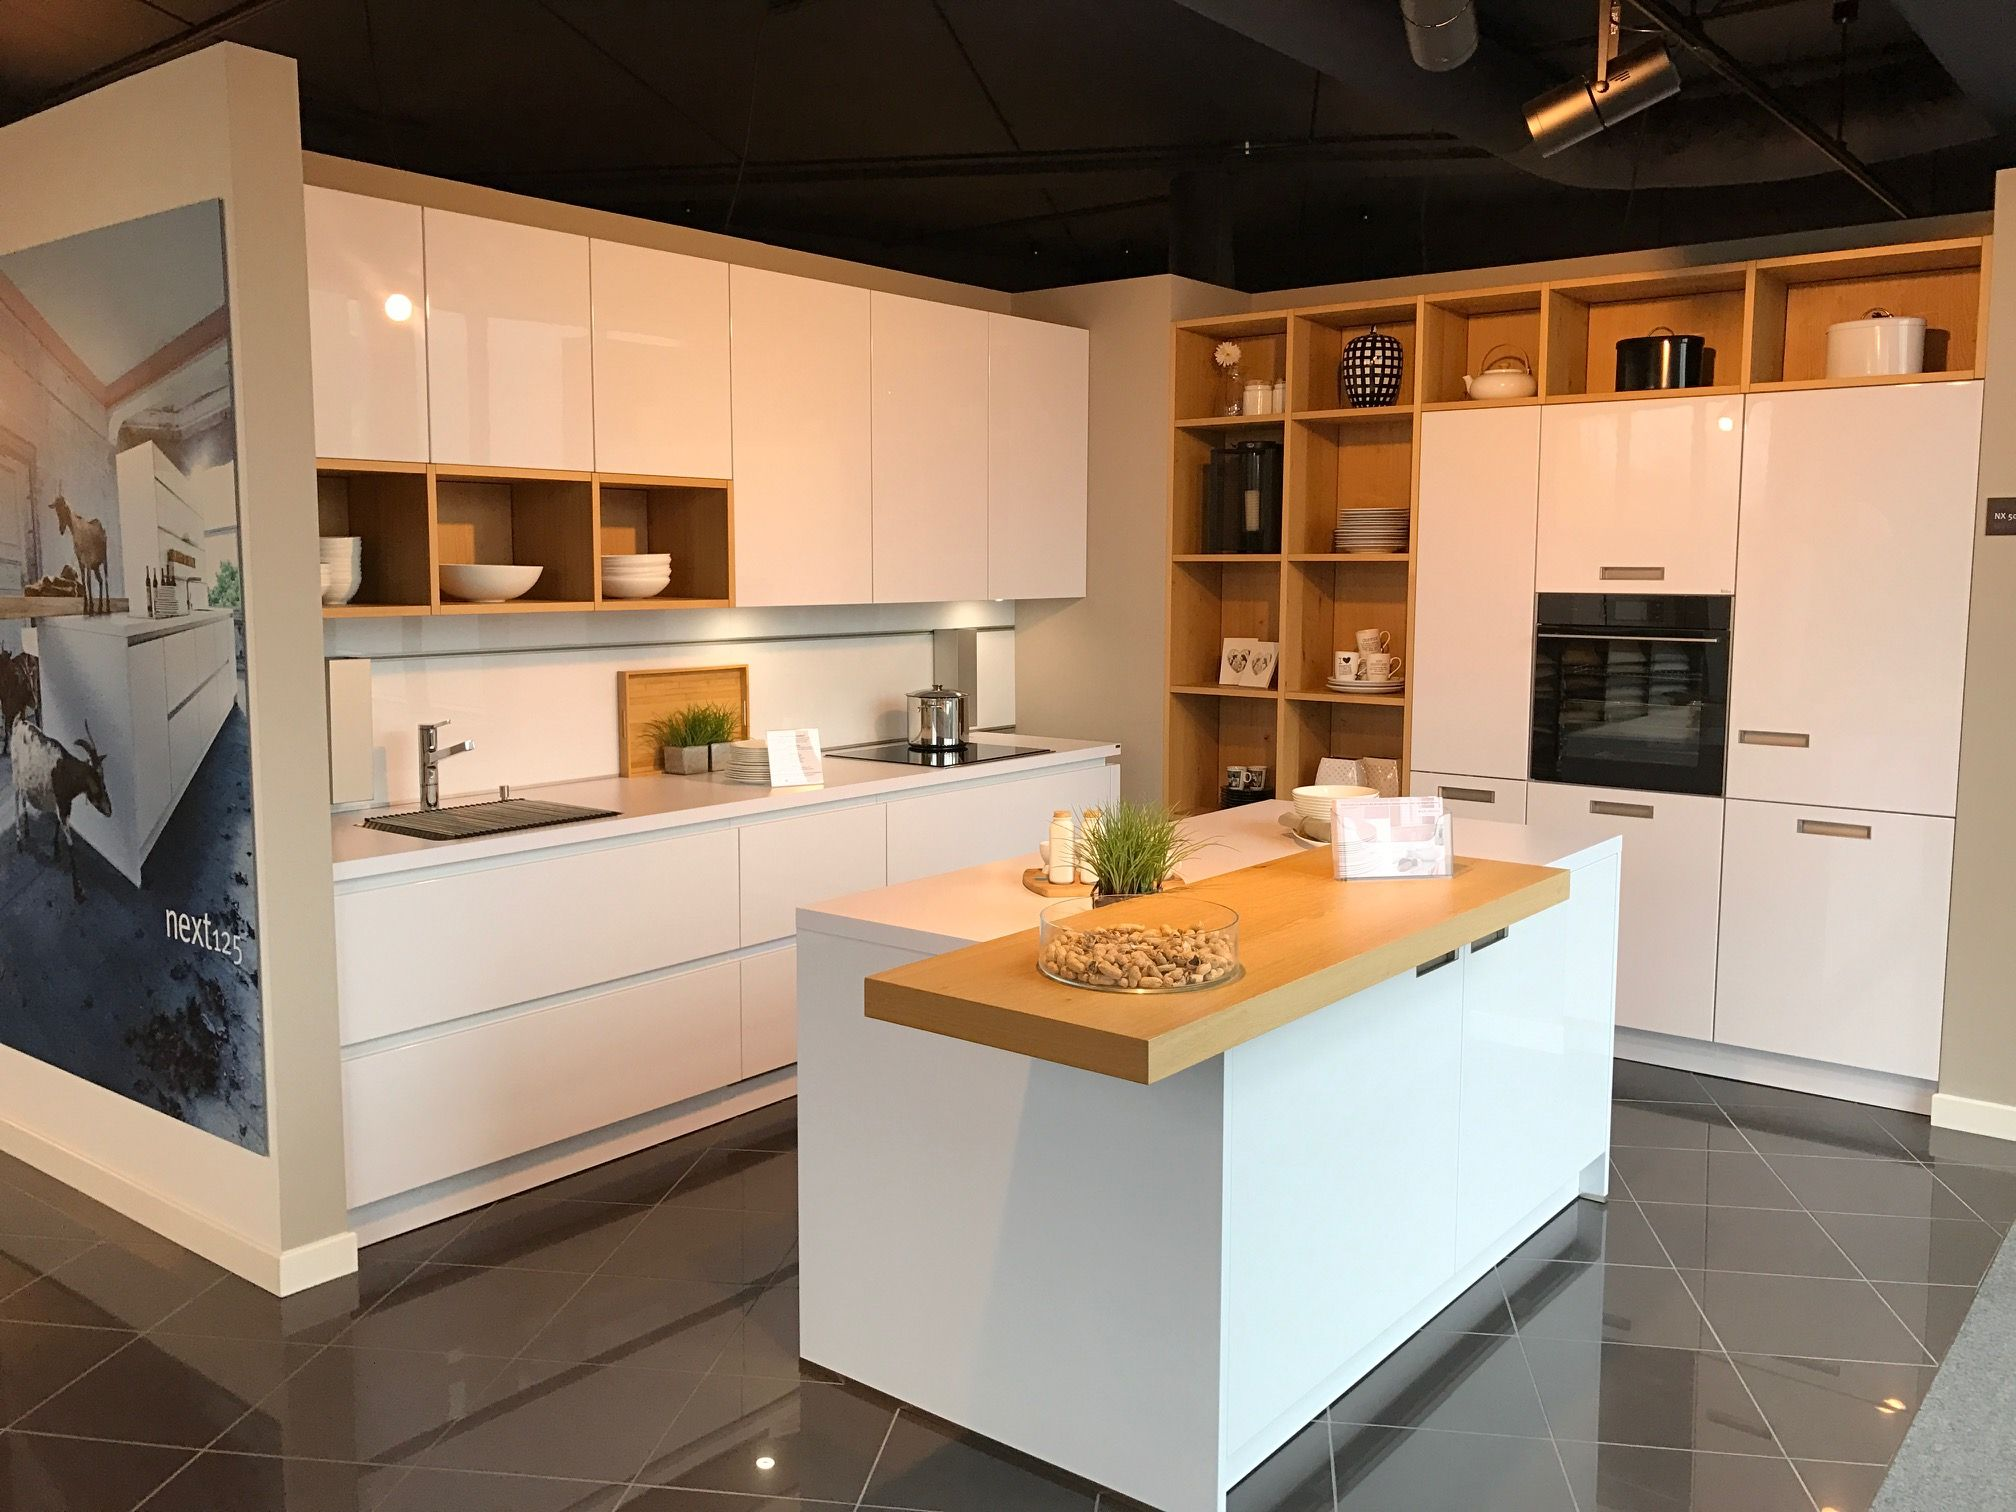 het grootste keukenaanbod van nederland sch ller next 125 nx501 57067. Black Bedroom Furniture Sets. Home Design Ideas